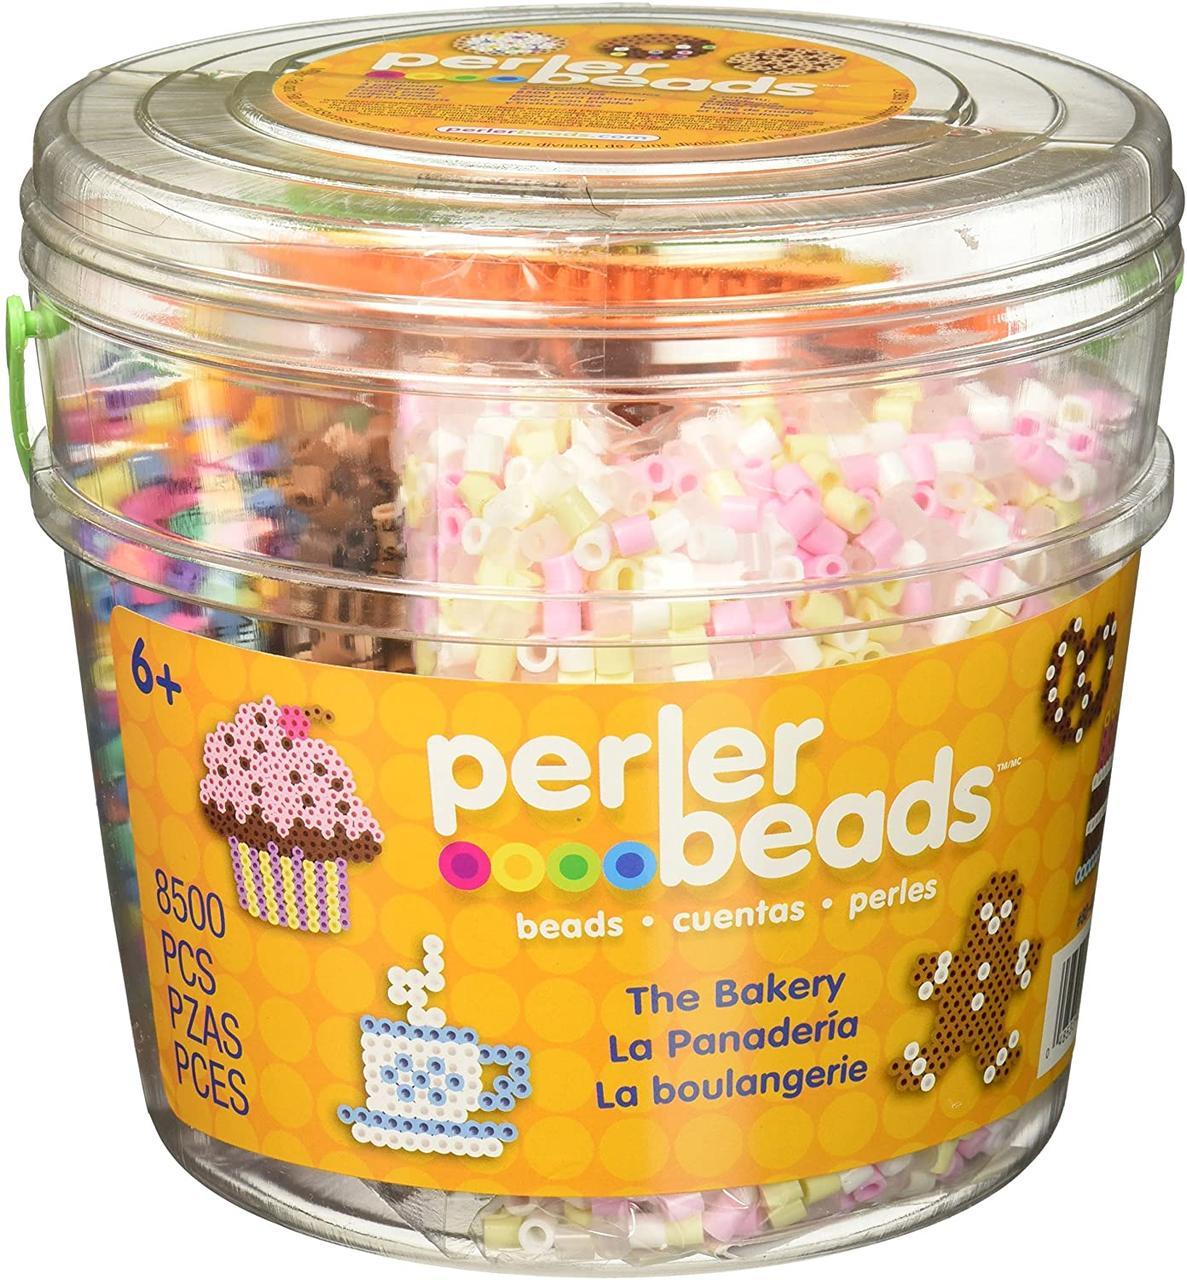 Perler Термомозаика пекарня 8500 бусинок, основы, бумага 80-42846 Bakery Fuse Bead Bucket Craft Activity Kit